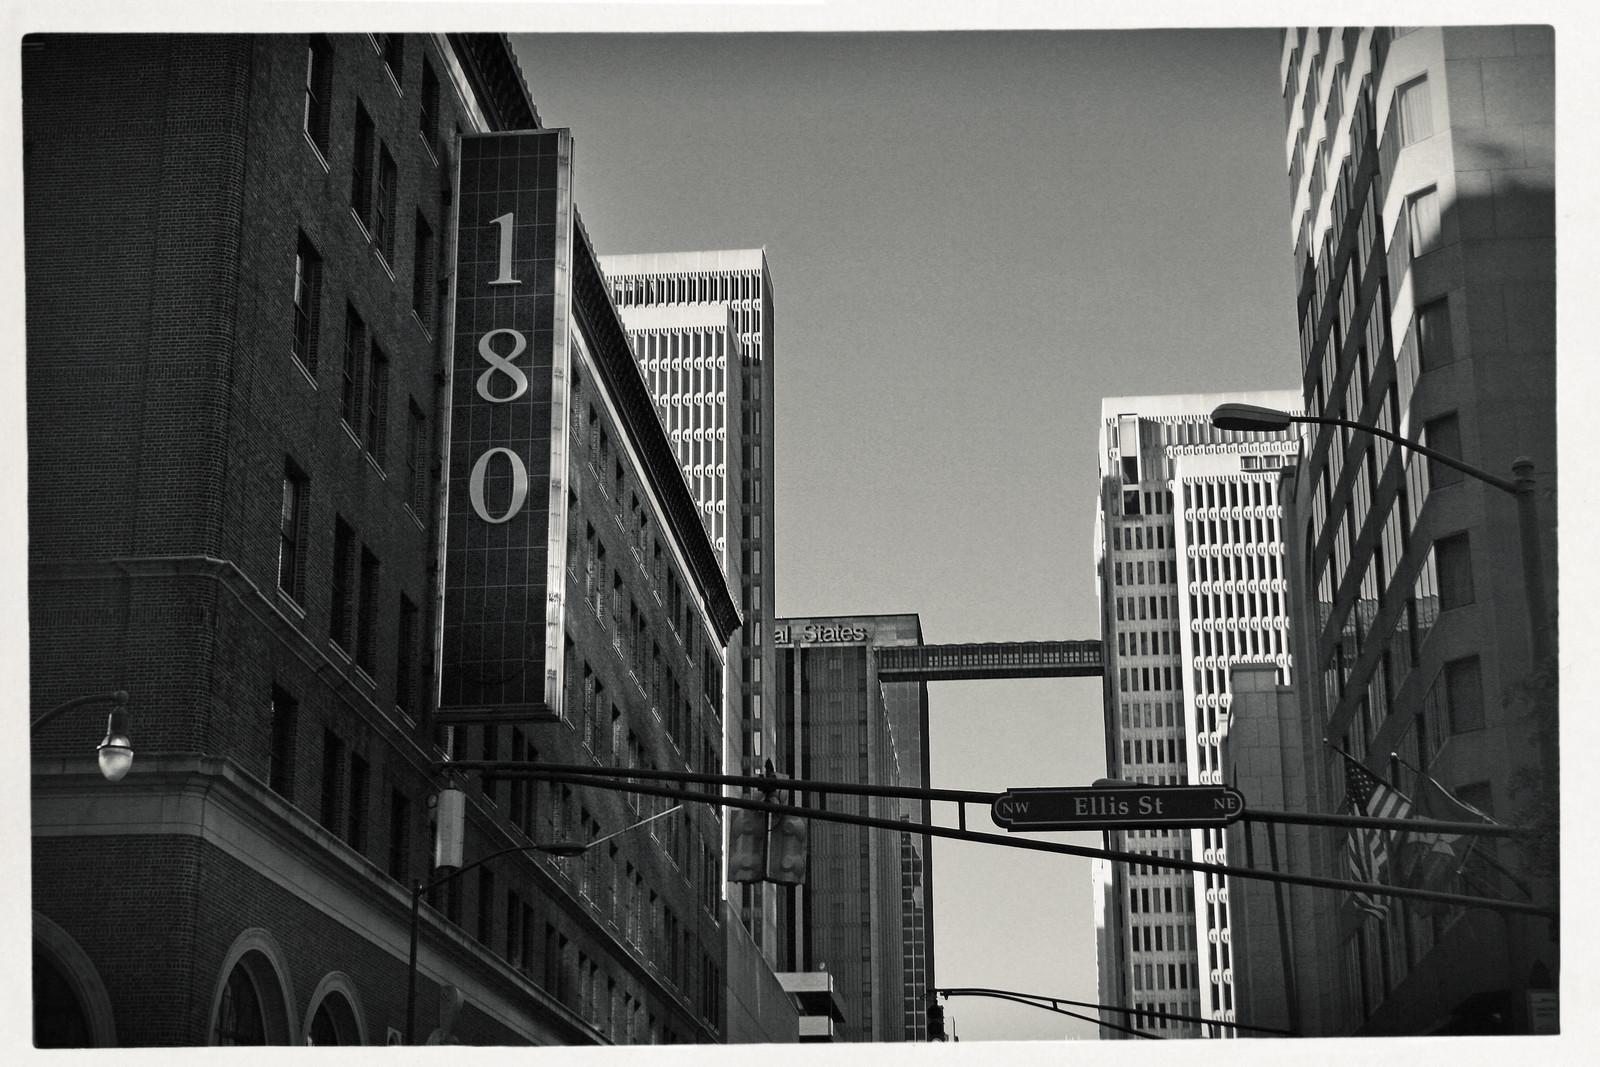 Peachtree Street and Ellis, Atlanta, GA